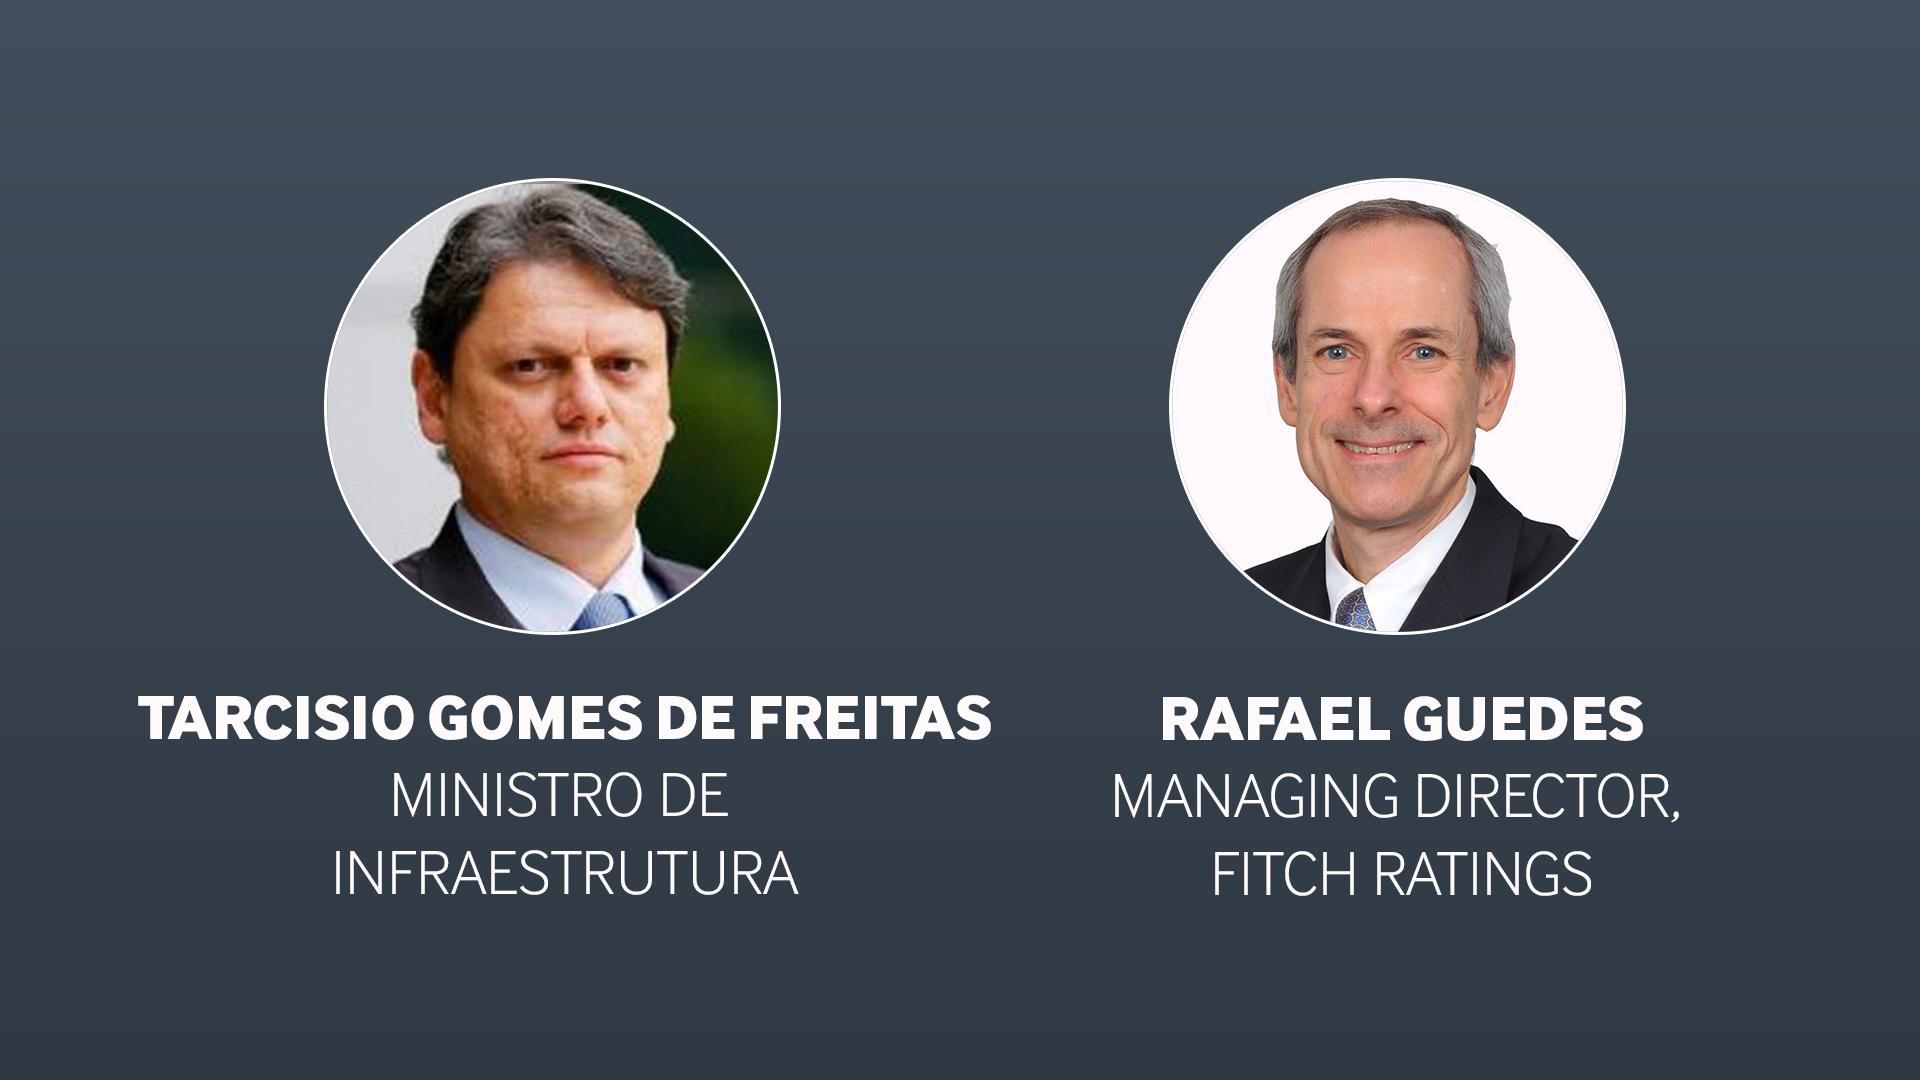 Fitch entrevista o Ministro de Infraestrutura Tarcisio Gomes de Freitas, Ministro de Infraestrutura